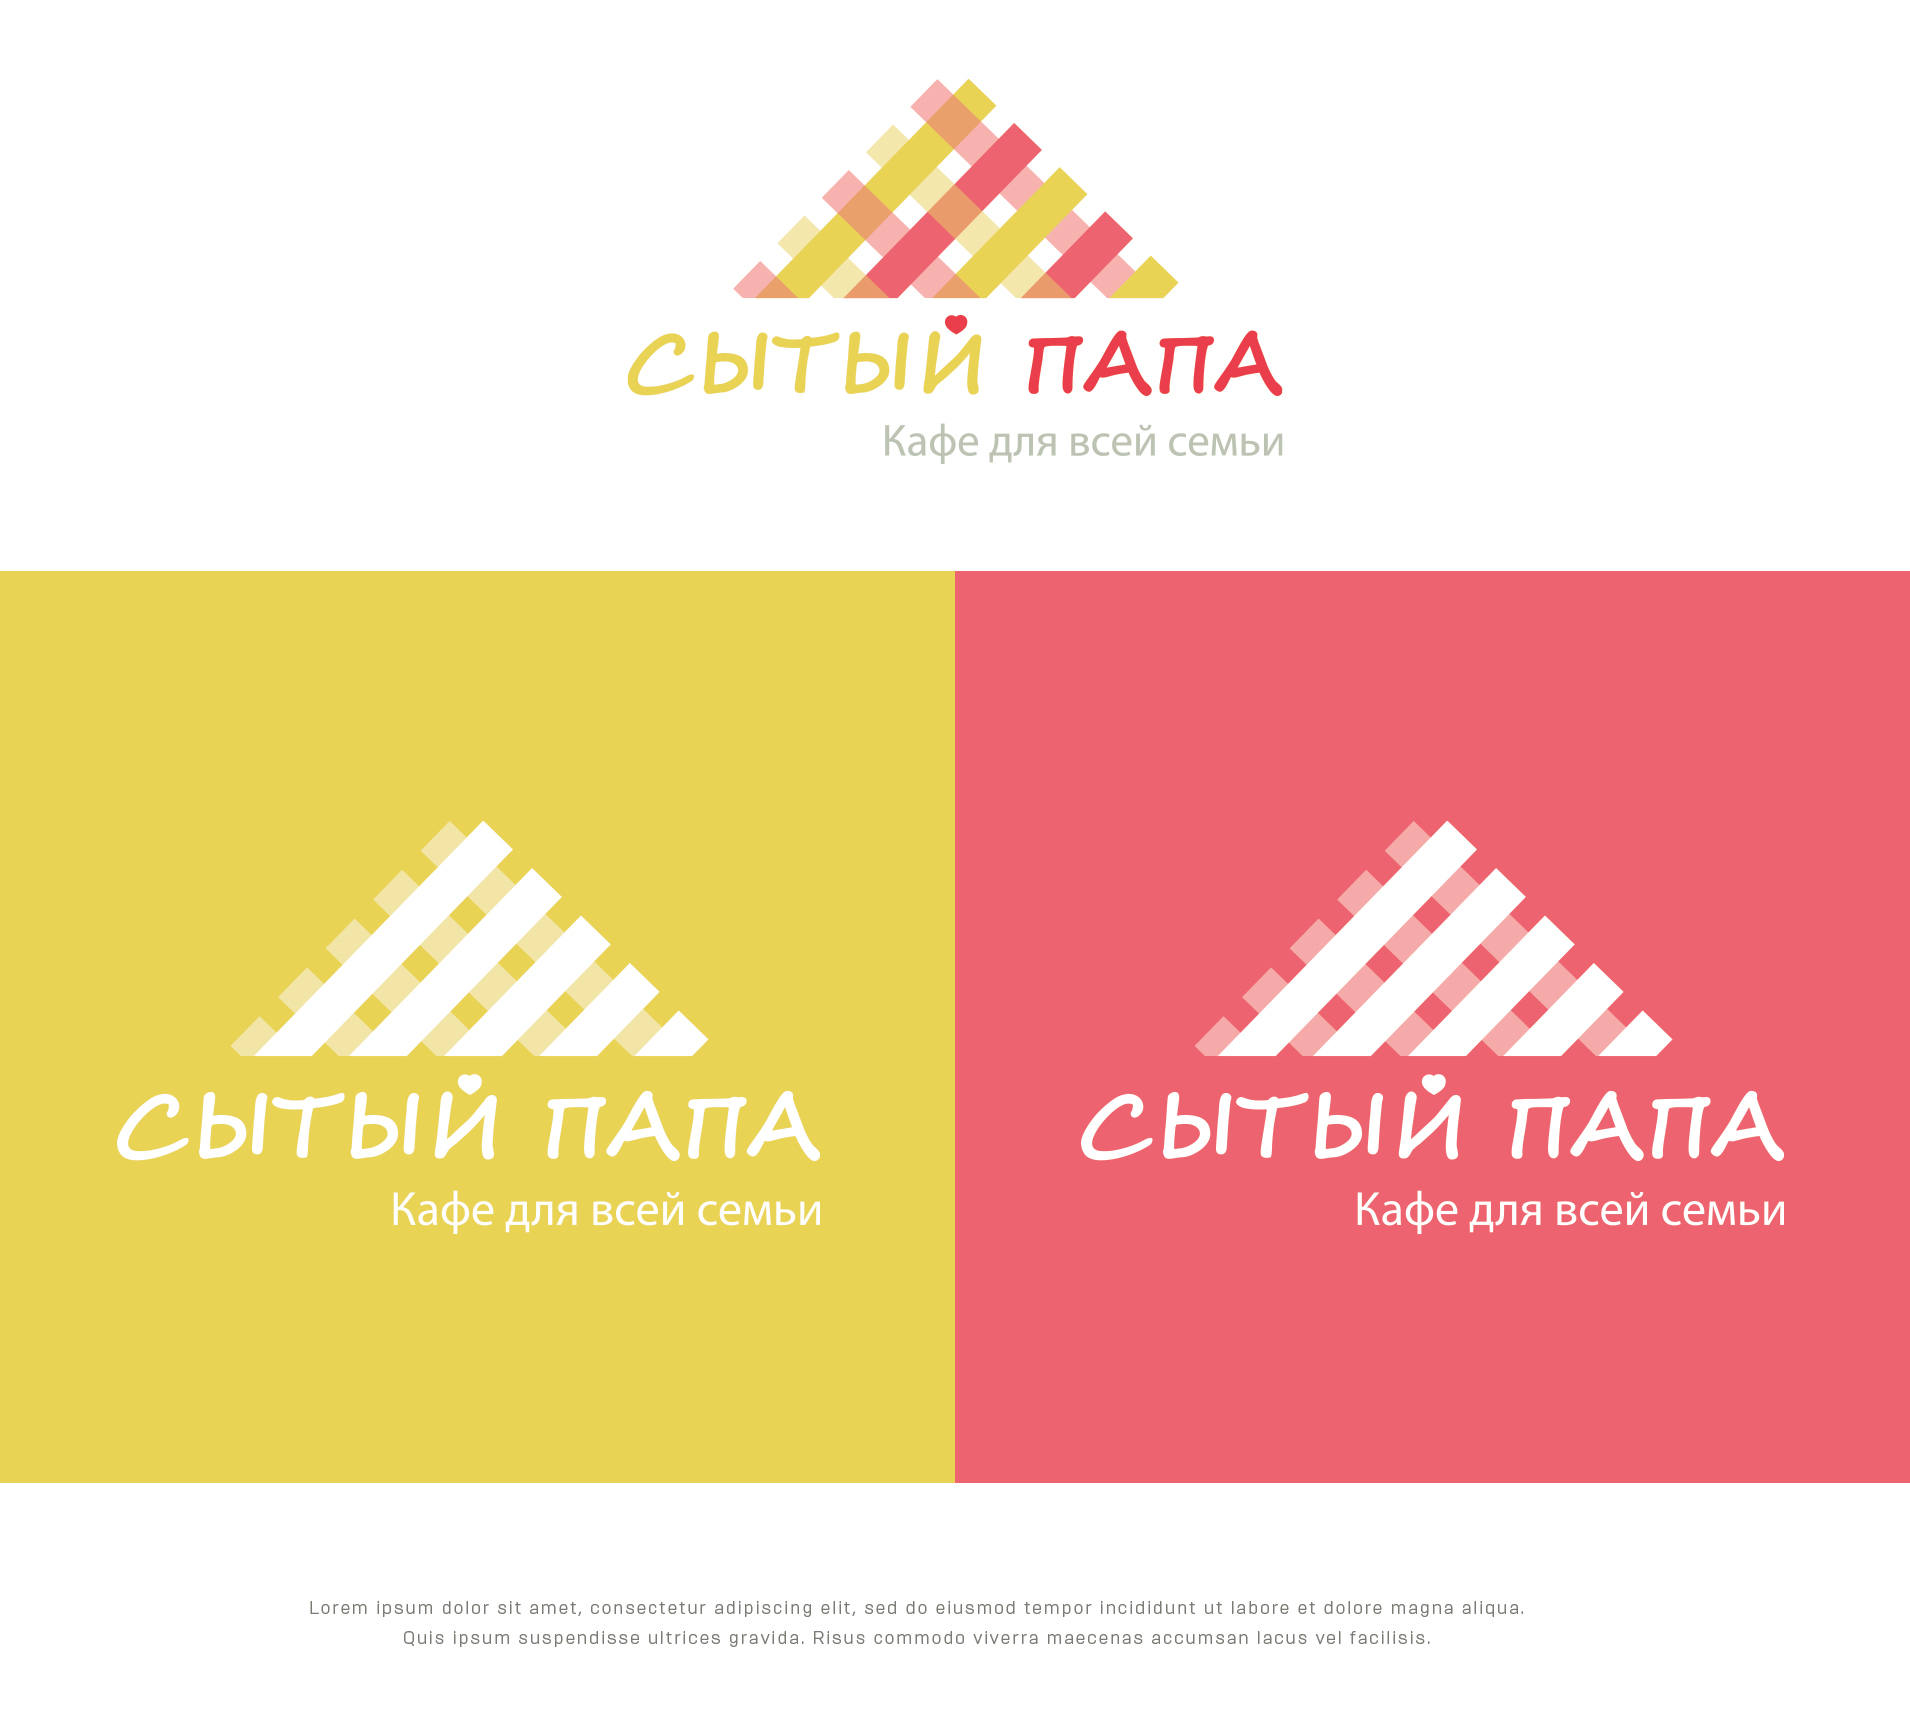 Графический дизайнер ЛОГОТИП и ФИРМЕННЫЙ СТИЛЬ фото f_0755e7a285e08c64.jpg